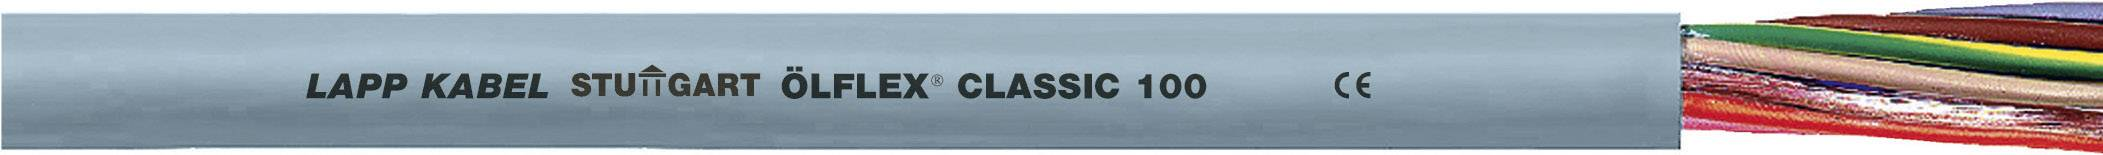 Kabel LappKabel Ölflex CLASSIC 100 18G1 (0010053), PVC, 12,7 mm, 500 V, šedá, 50 m